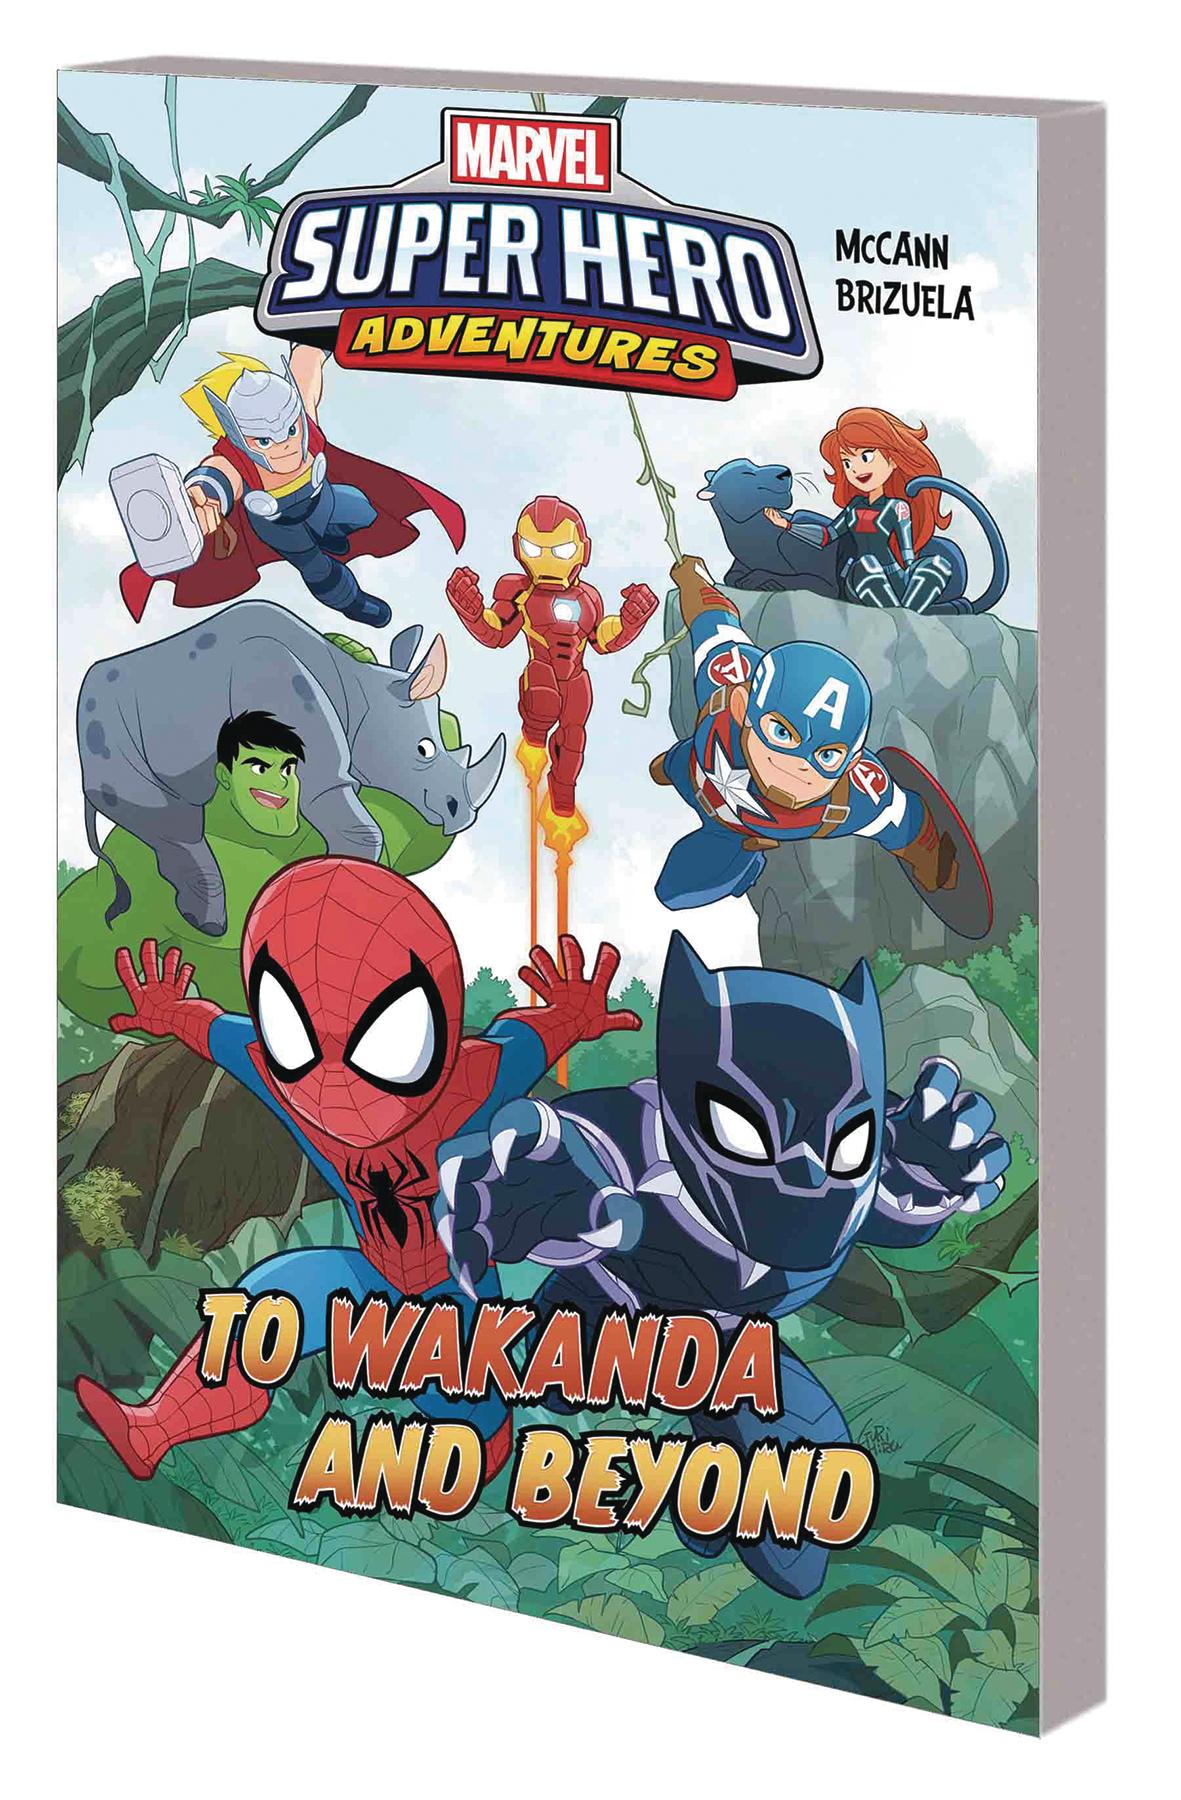 Marvel Superhero Adventures HC To Wakanda and Beyond